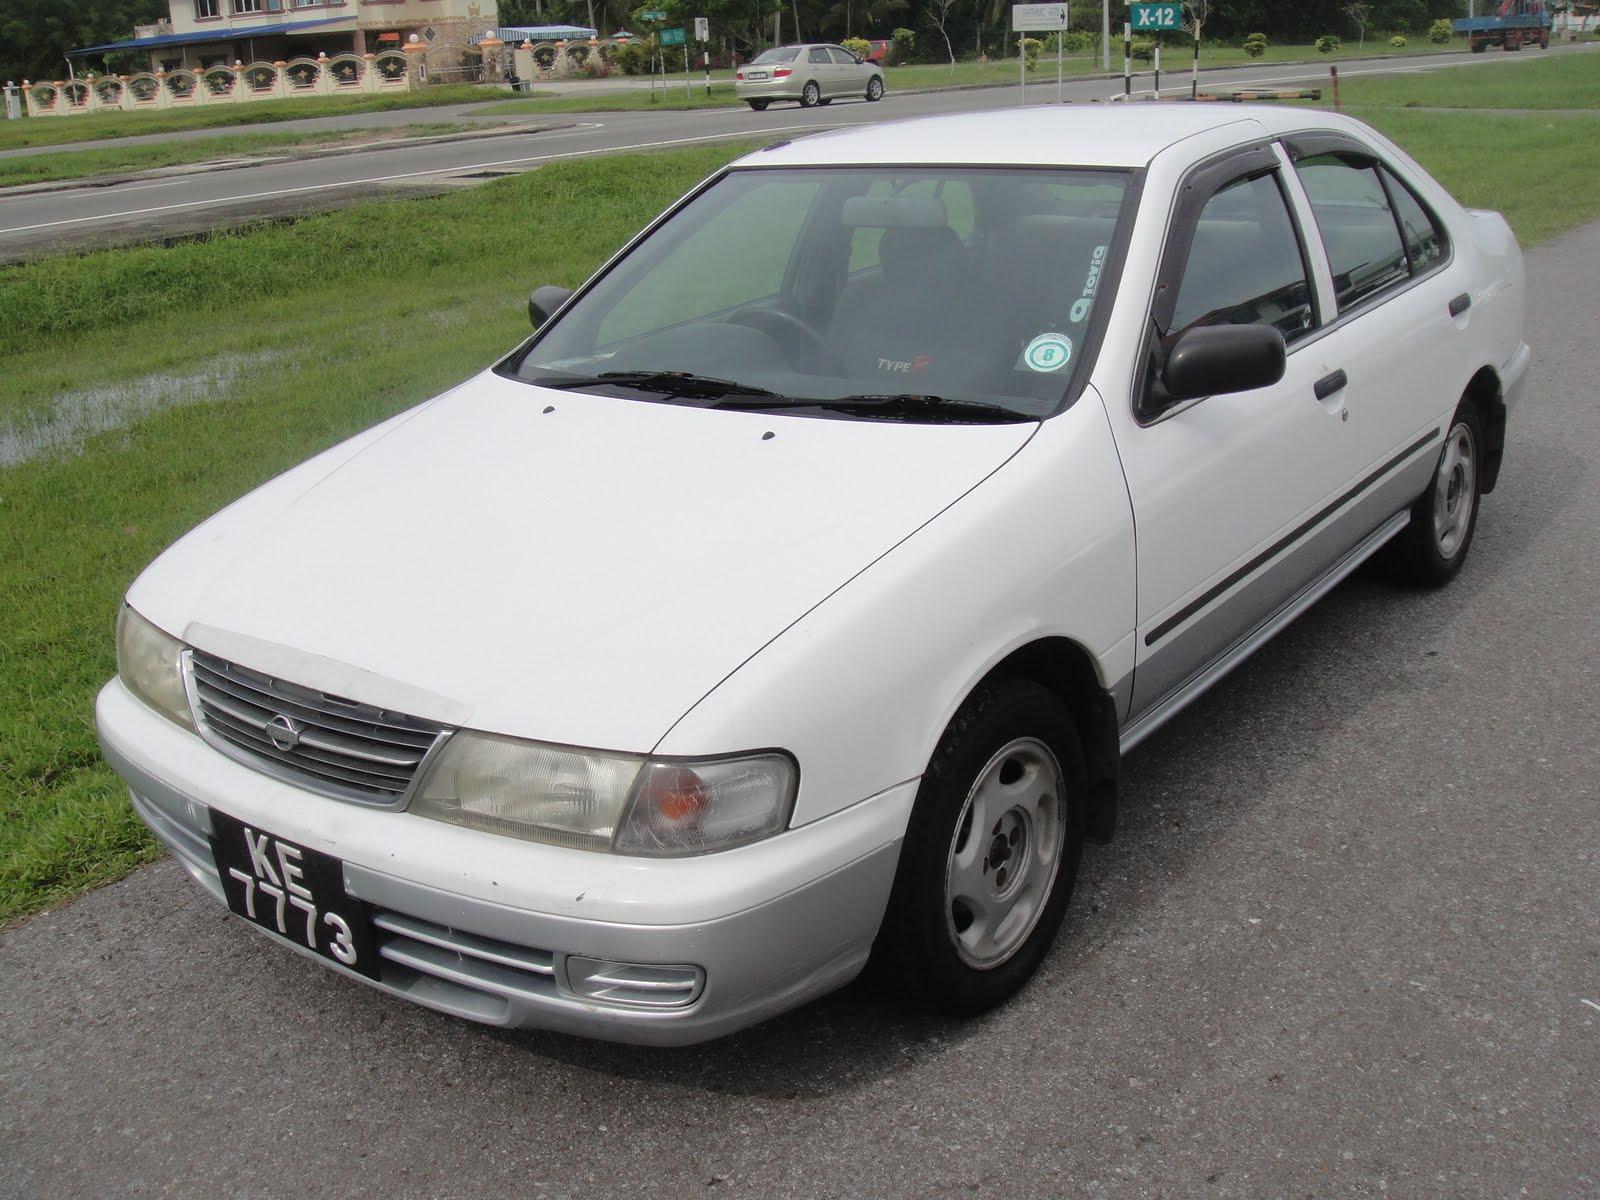 Nissan Sunny 2.0 Diesel